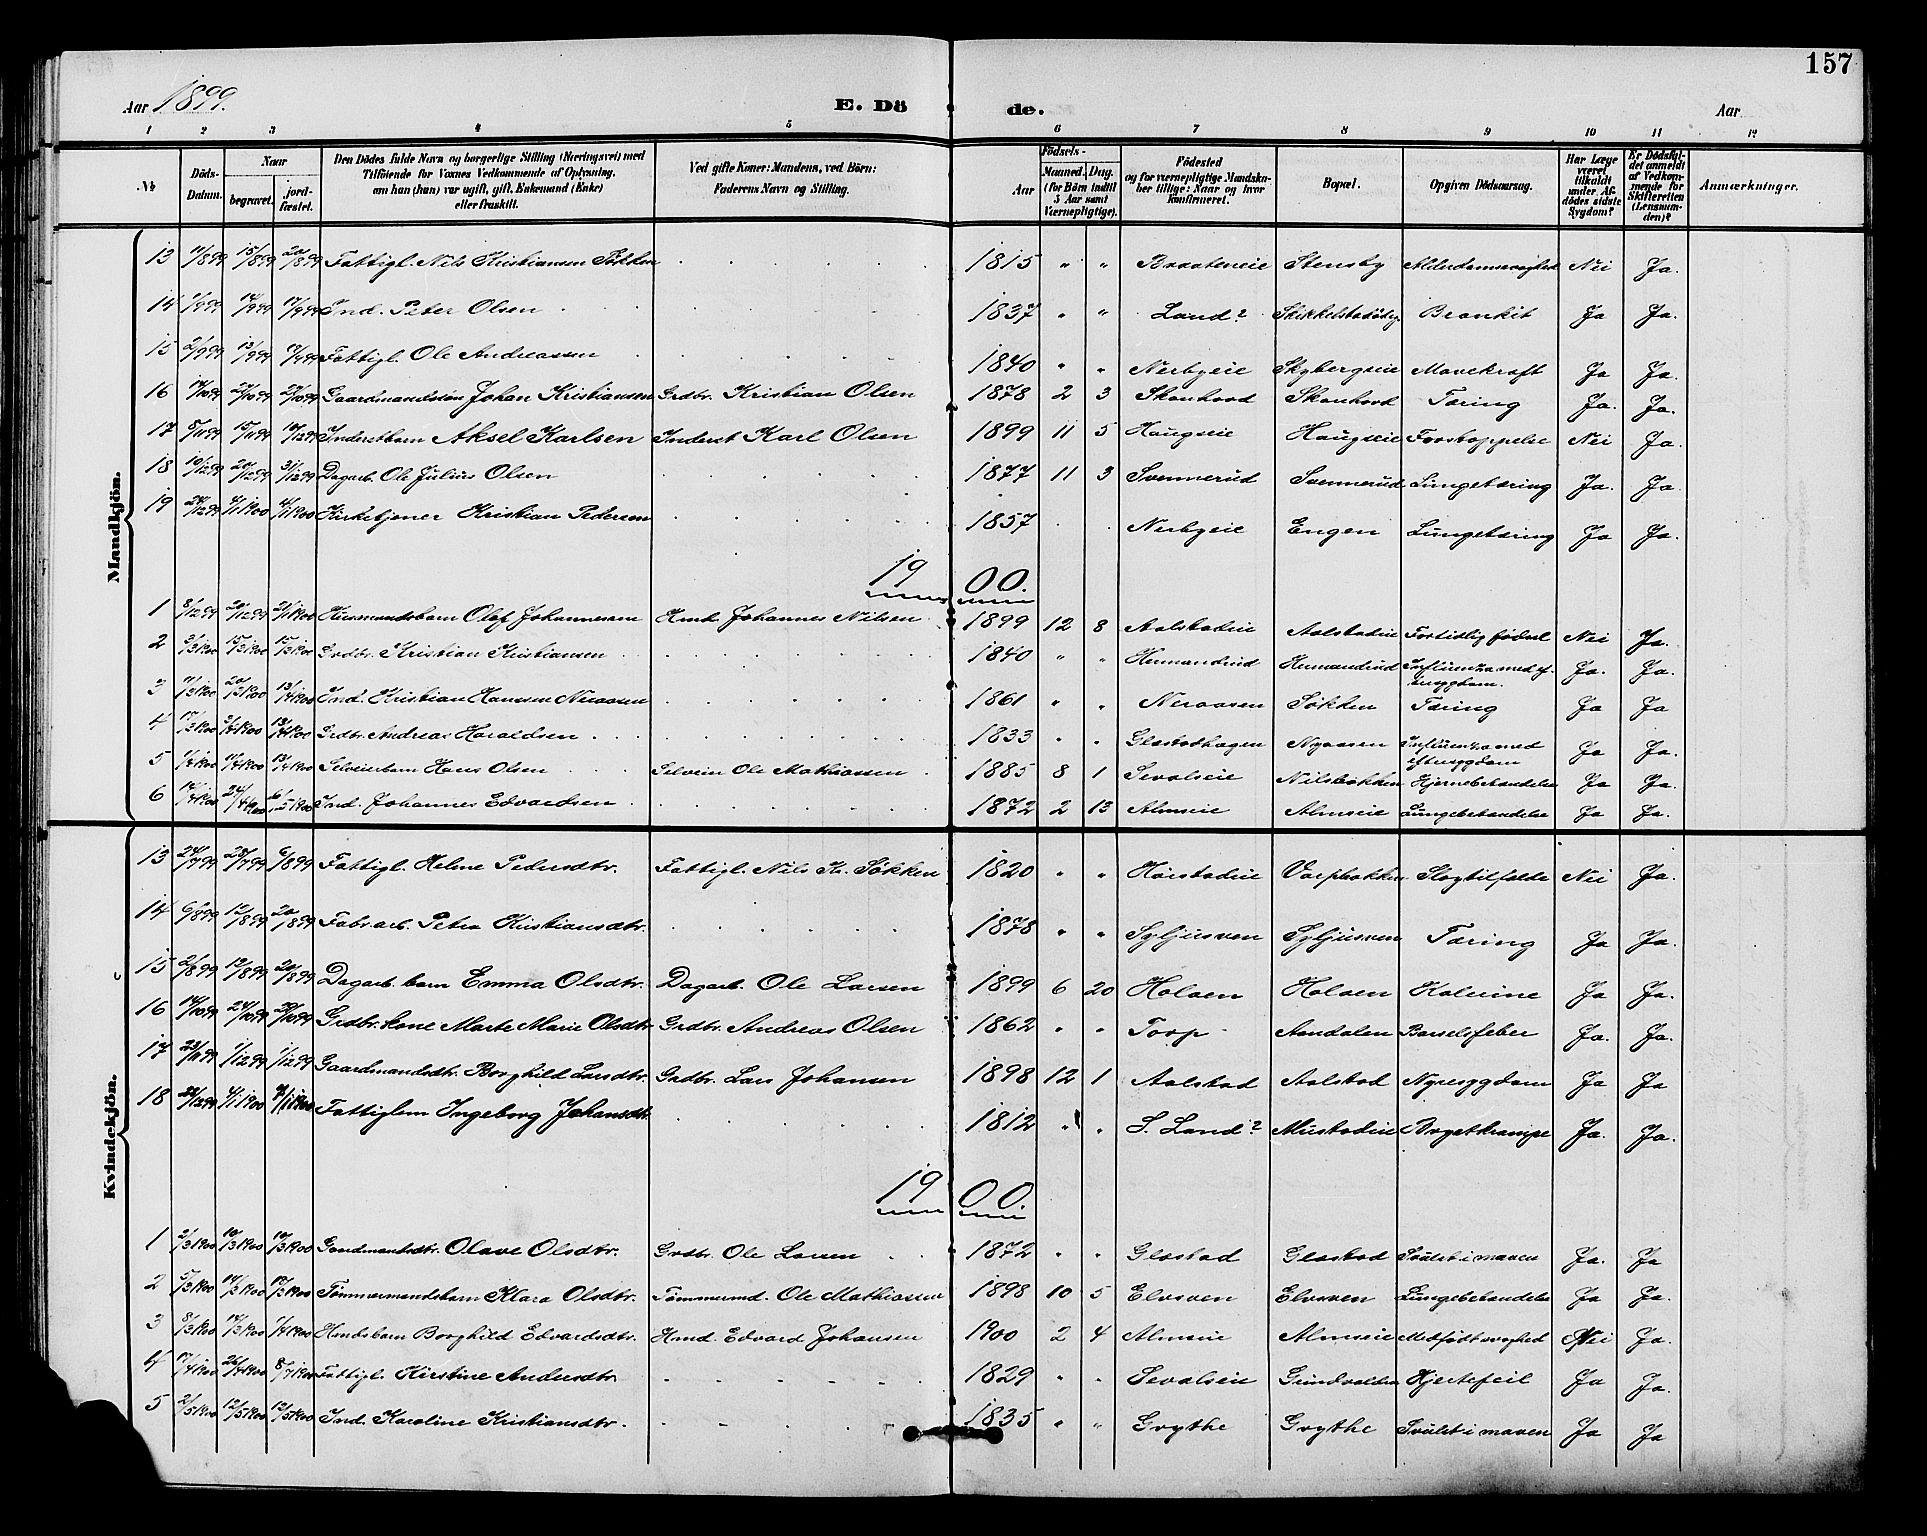 SAH, Vardal prestekontor, H/Ha/Hab/L0011: Klokkerbok nr. 11, 1899-1913, s. 157